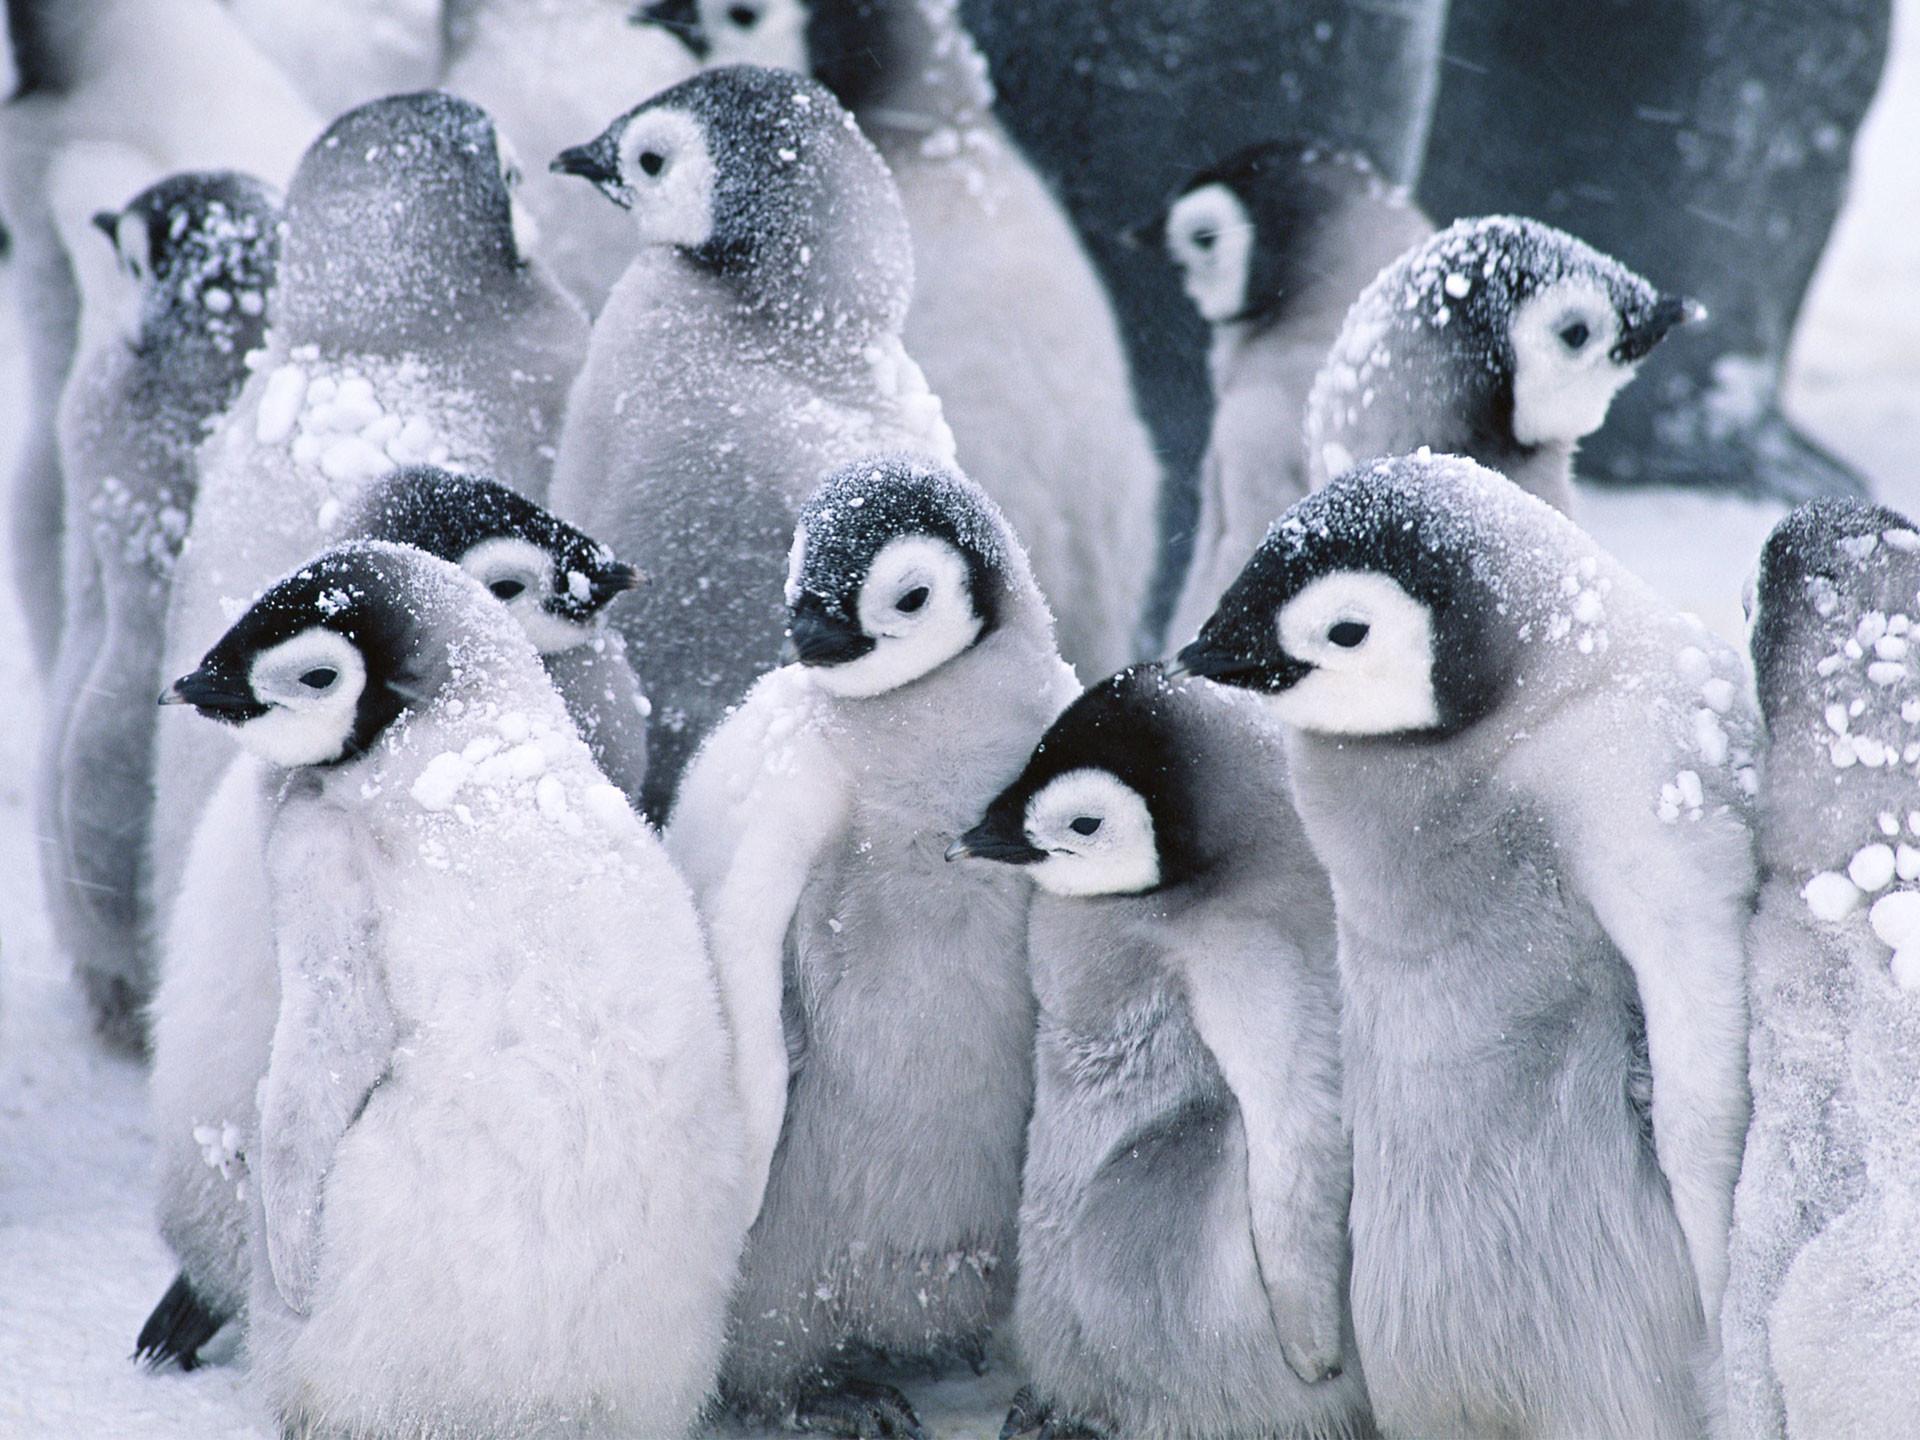 Cute Arctic Penguins Wallpapers   HD Wallpapers